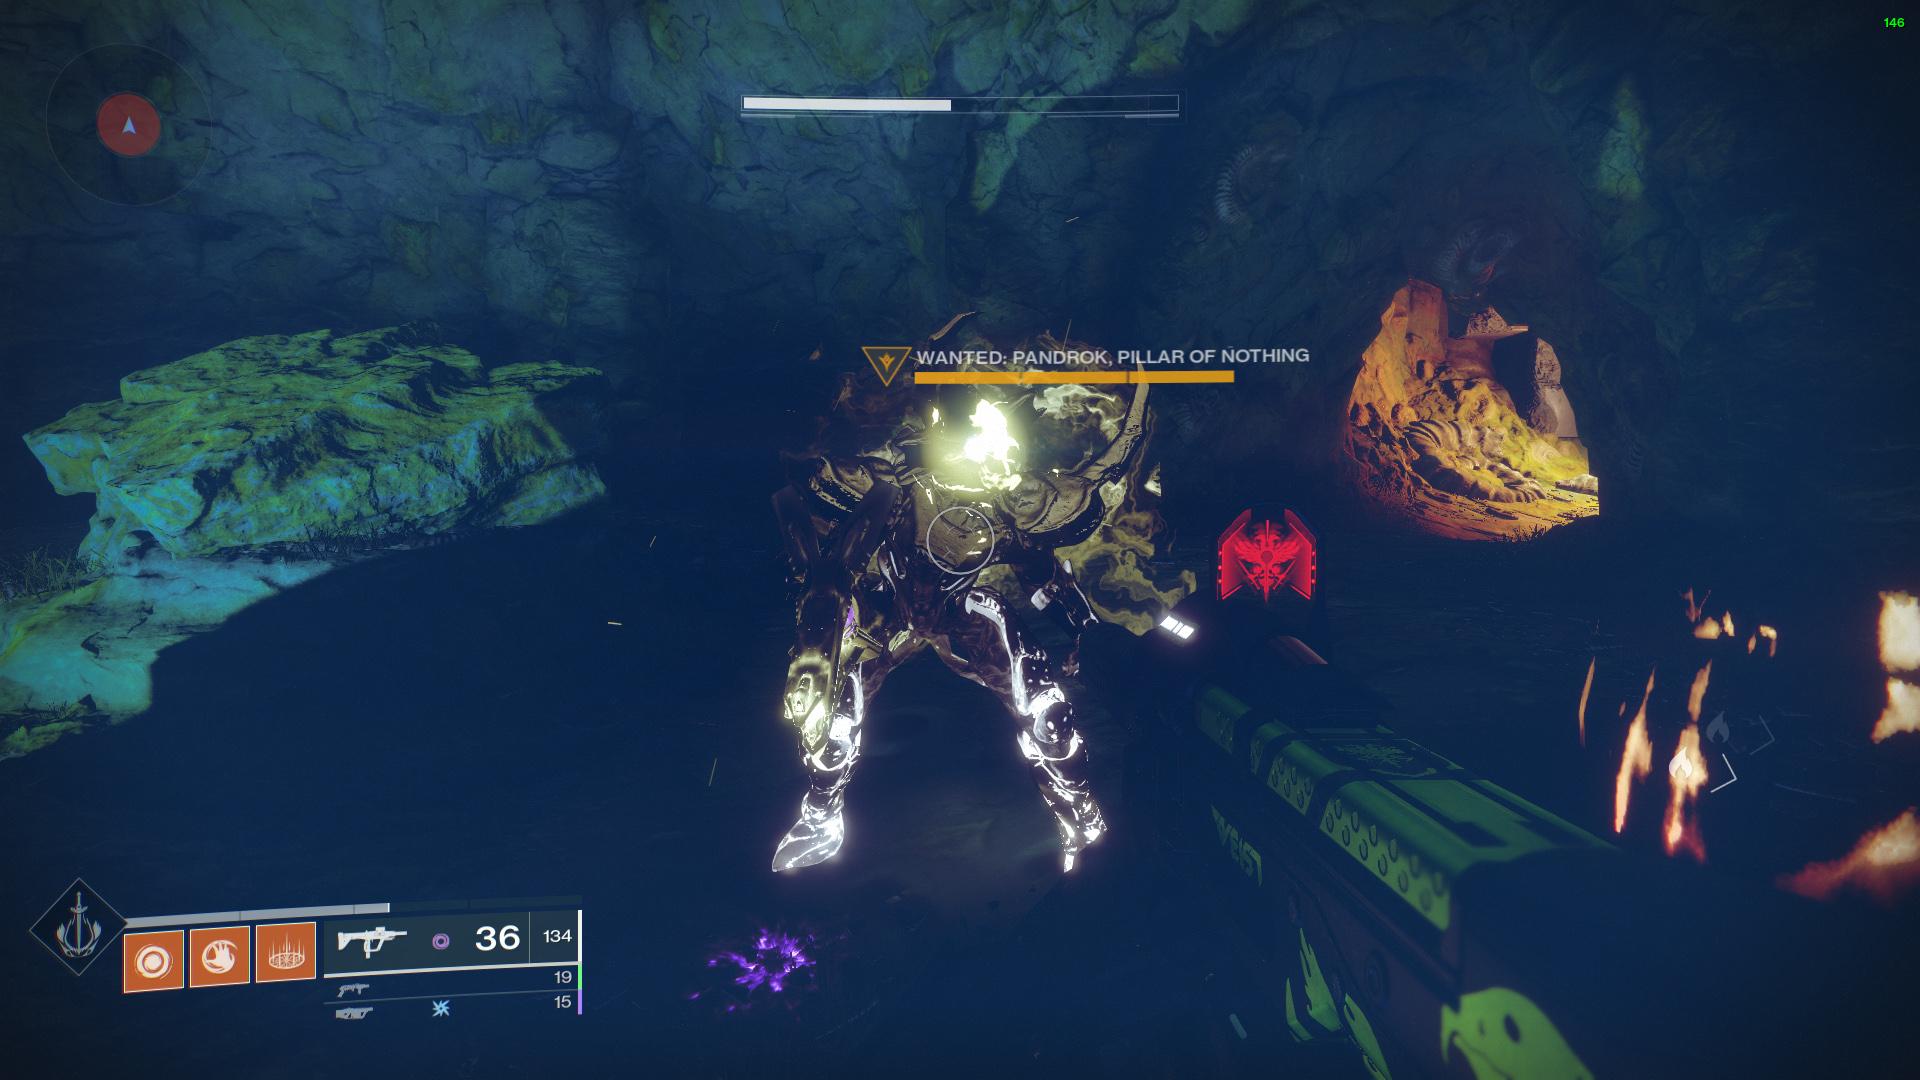 destiny 2 pandrok pillar of nothing